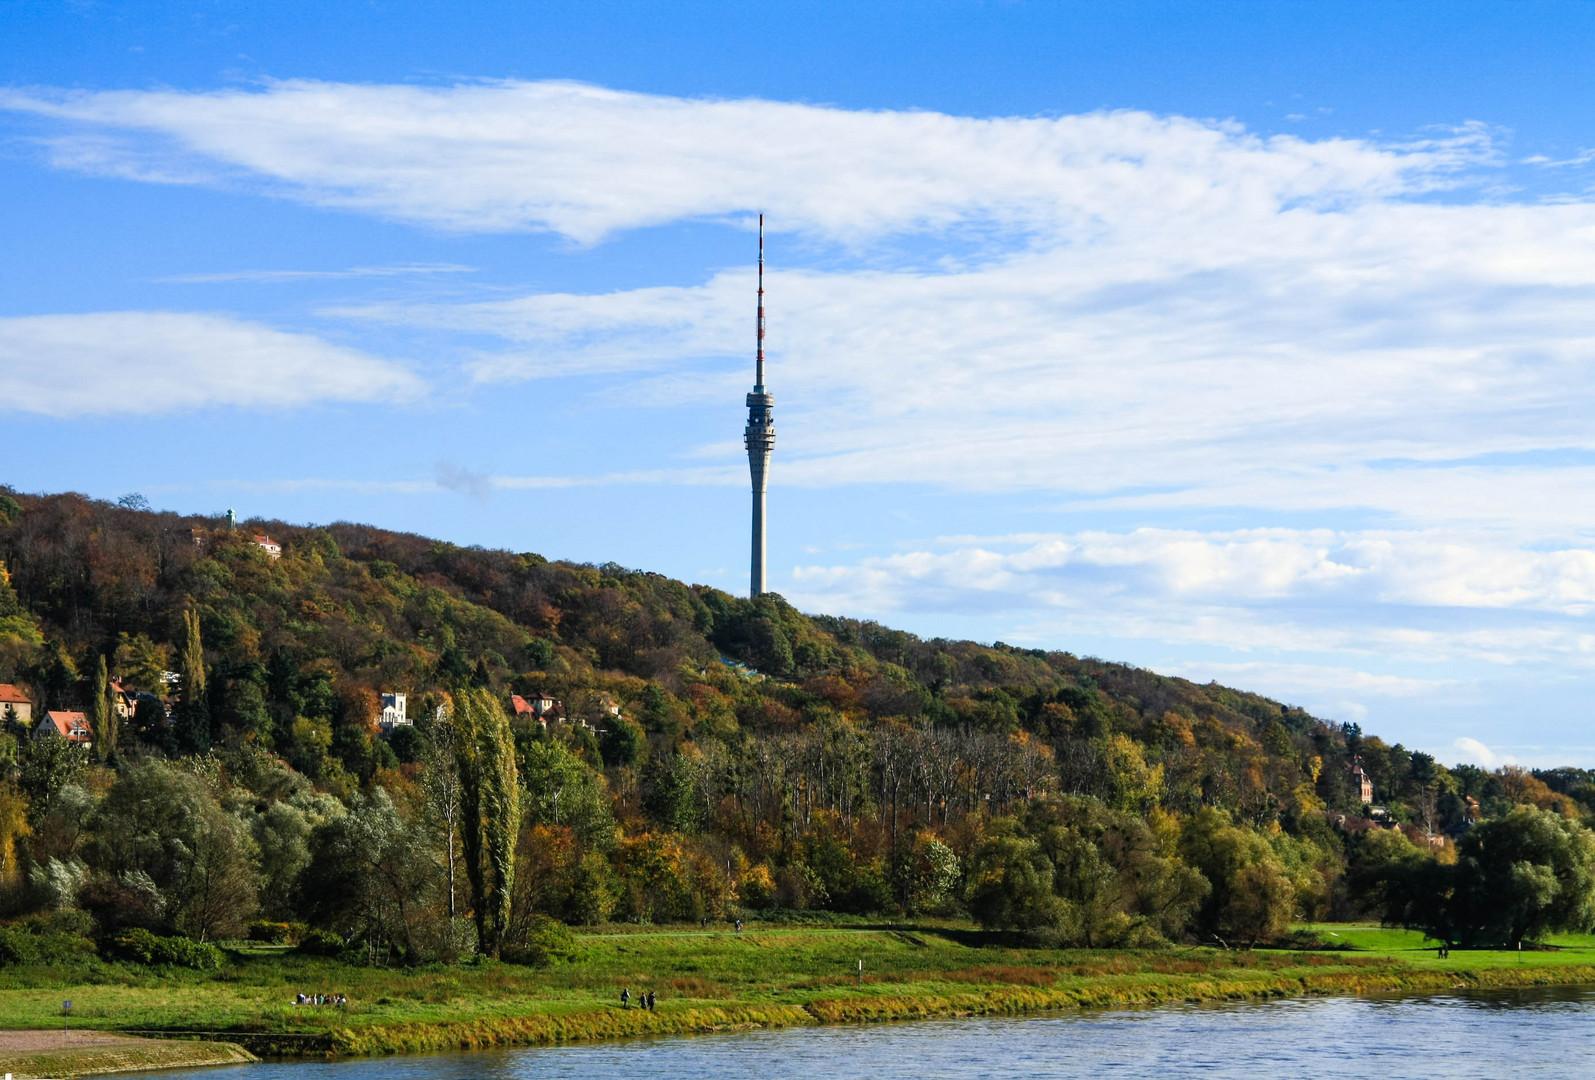 Der Dresdner Fernsehturm